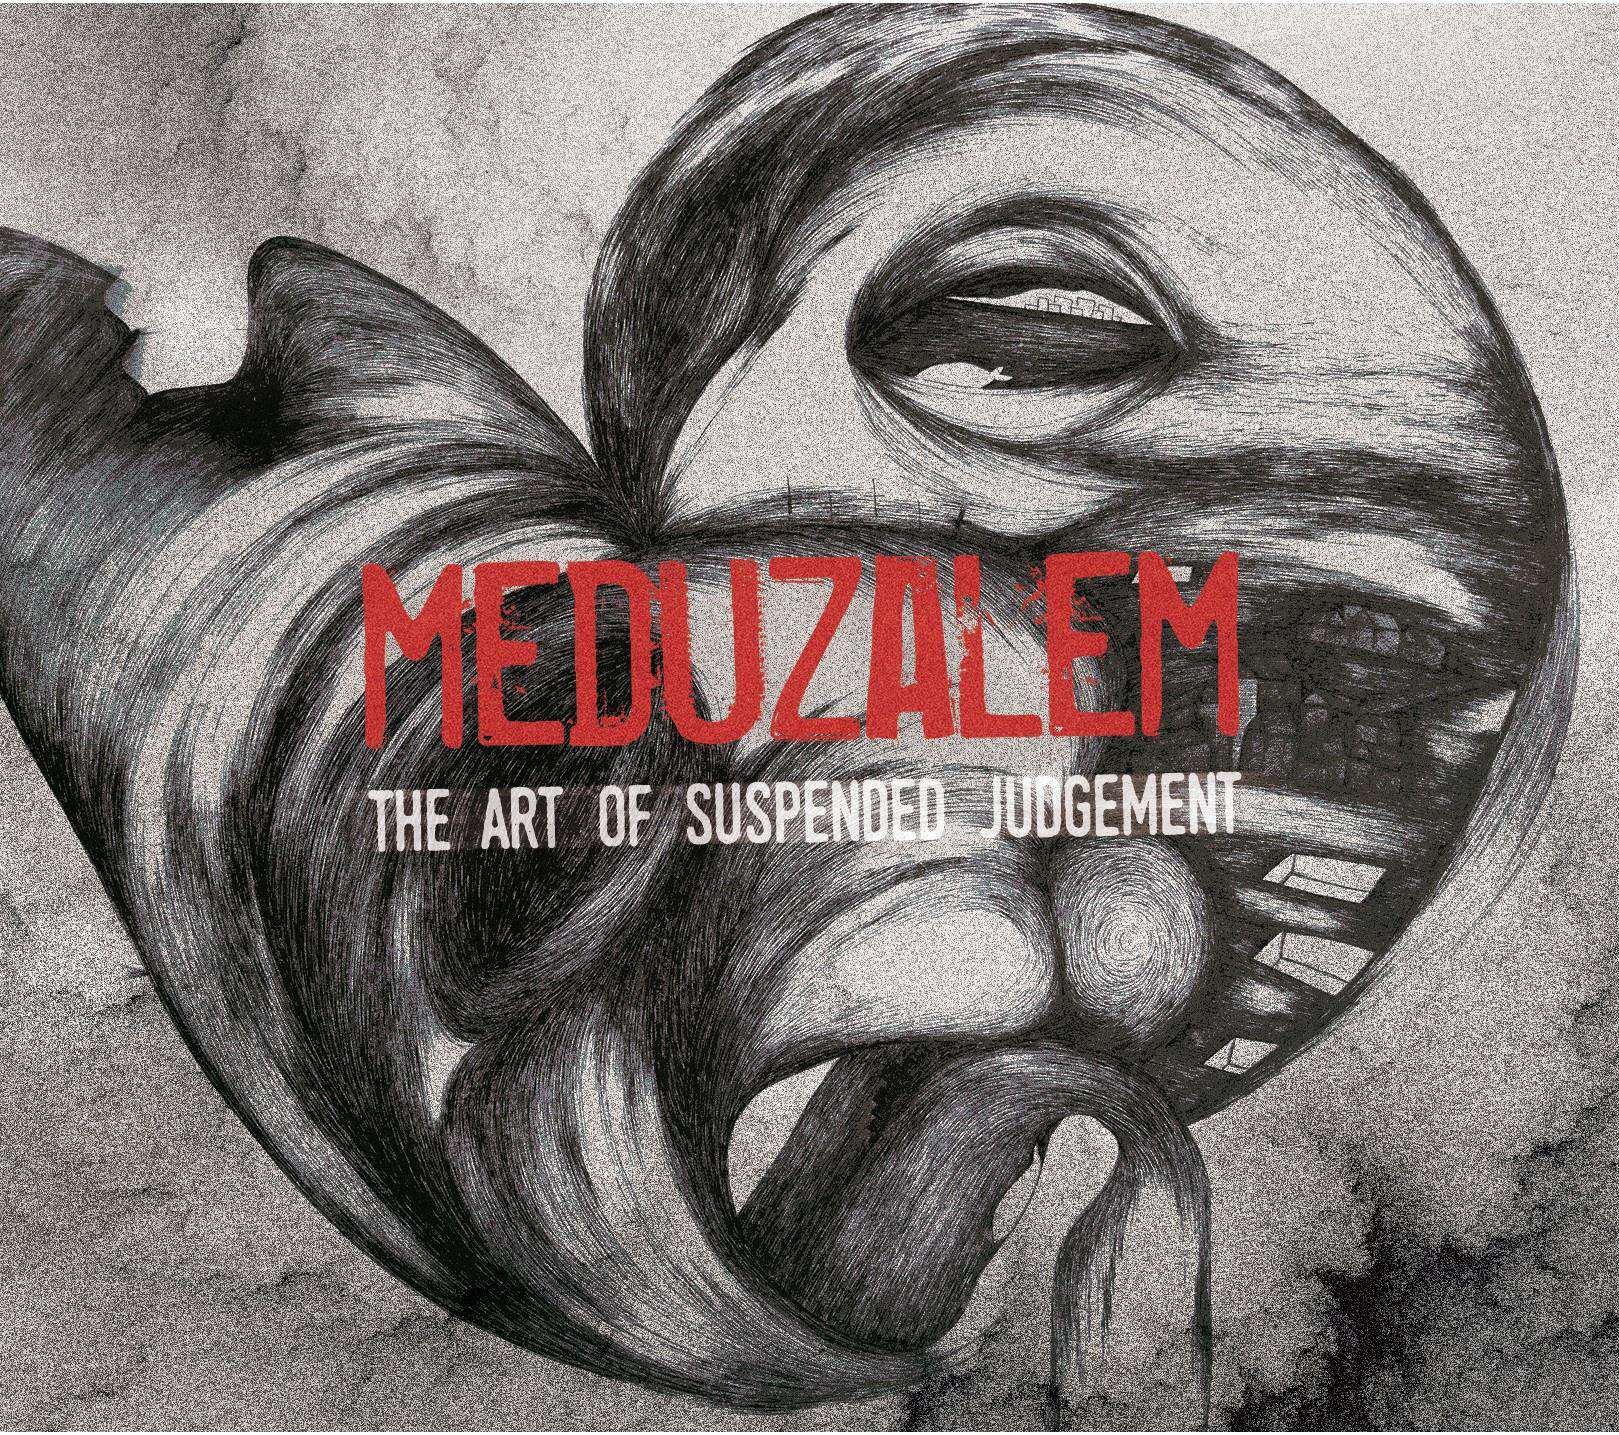 MeduzaleM – The Art Of Suspended Judgement